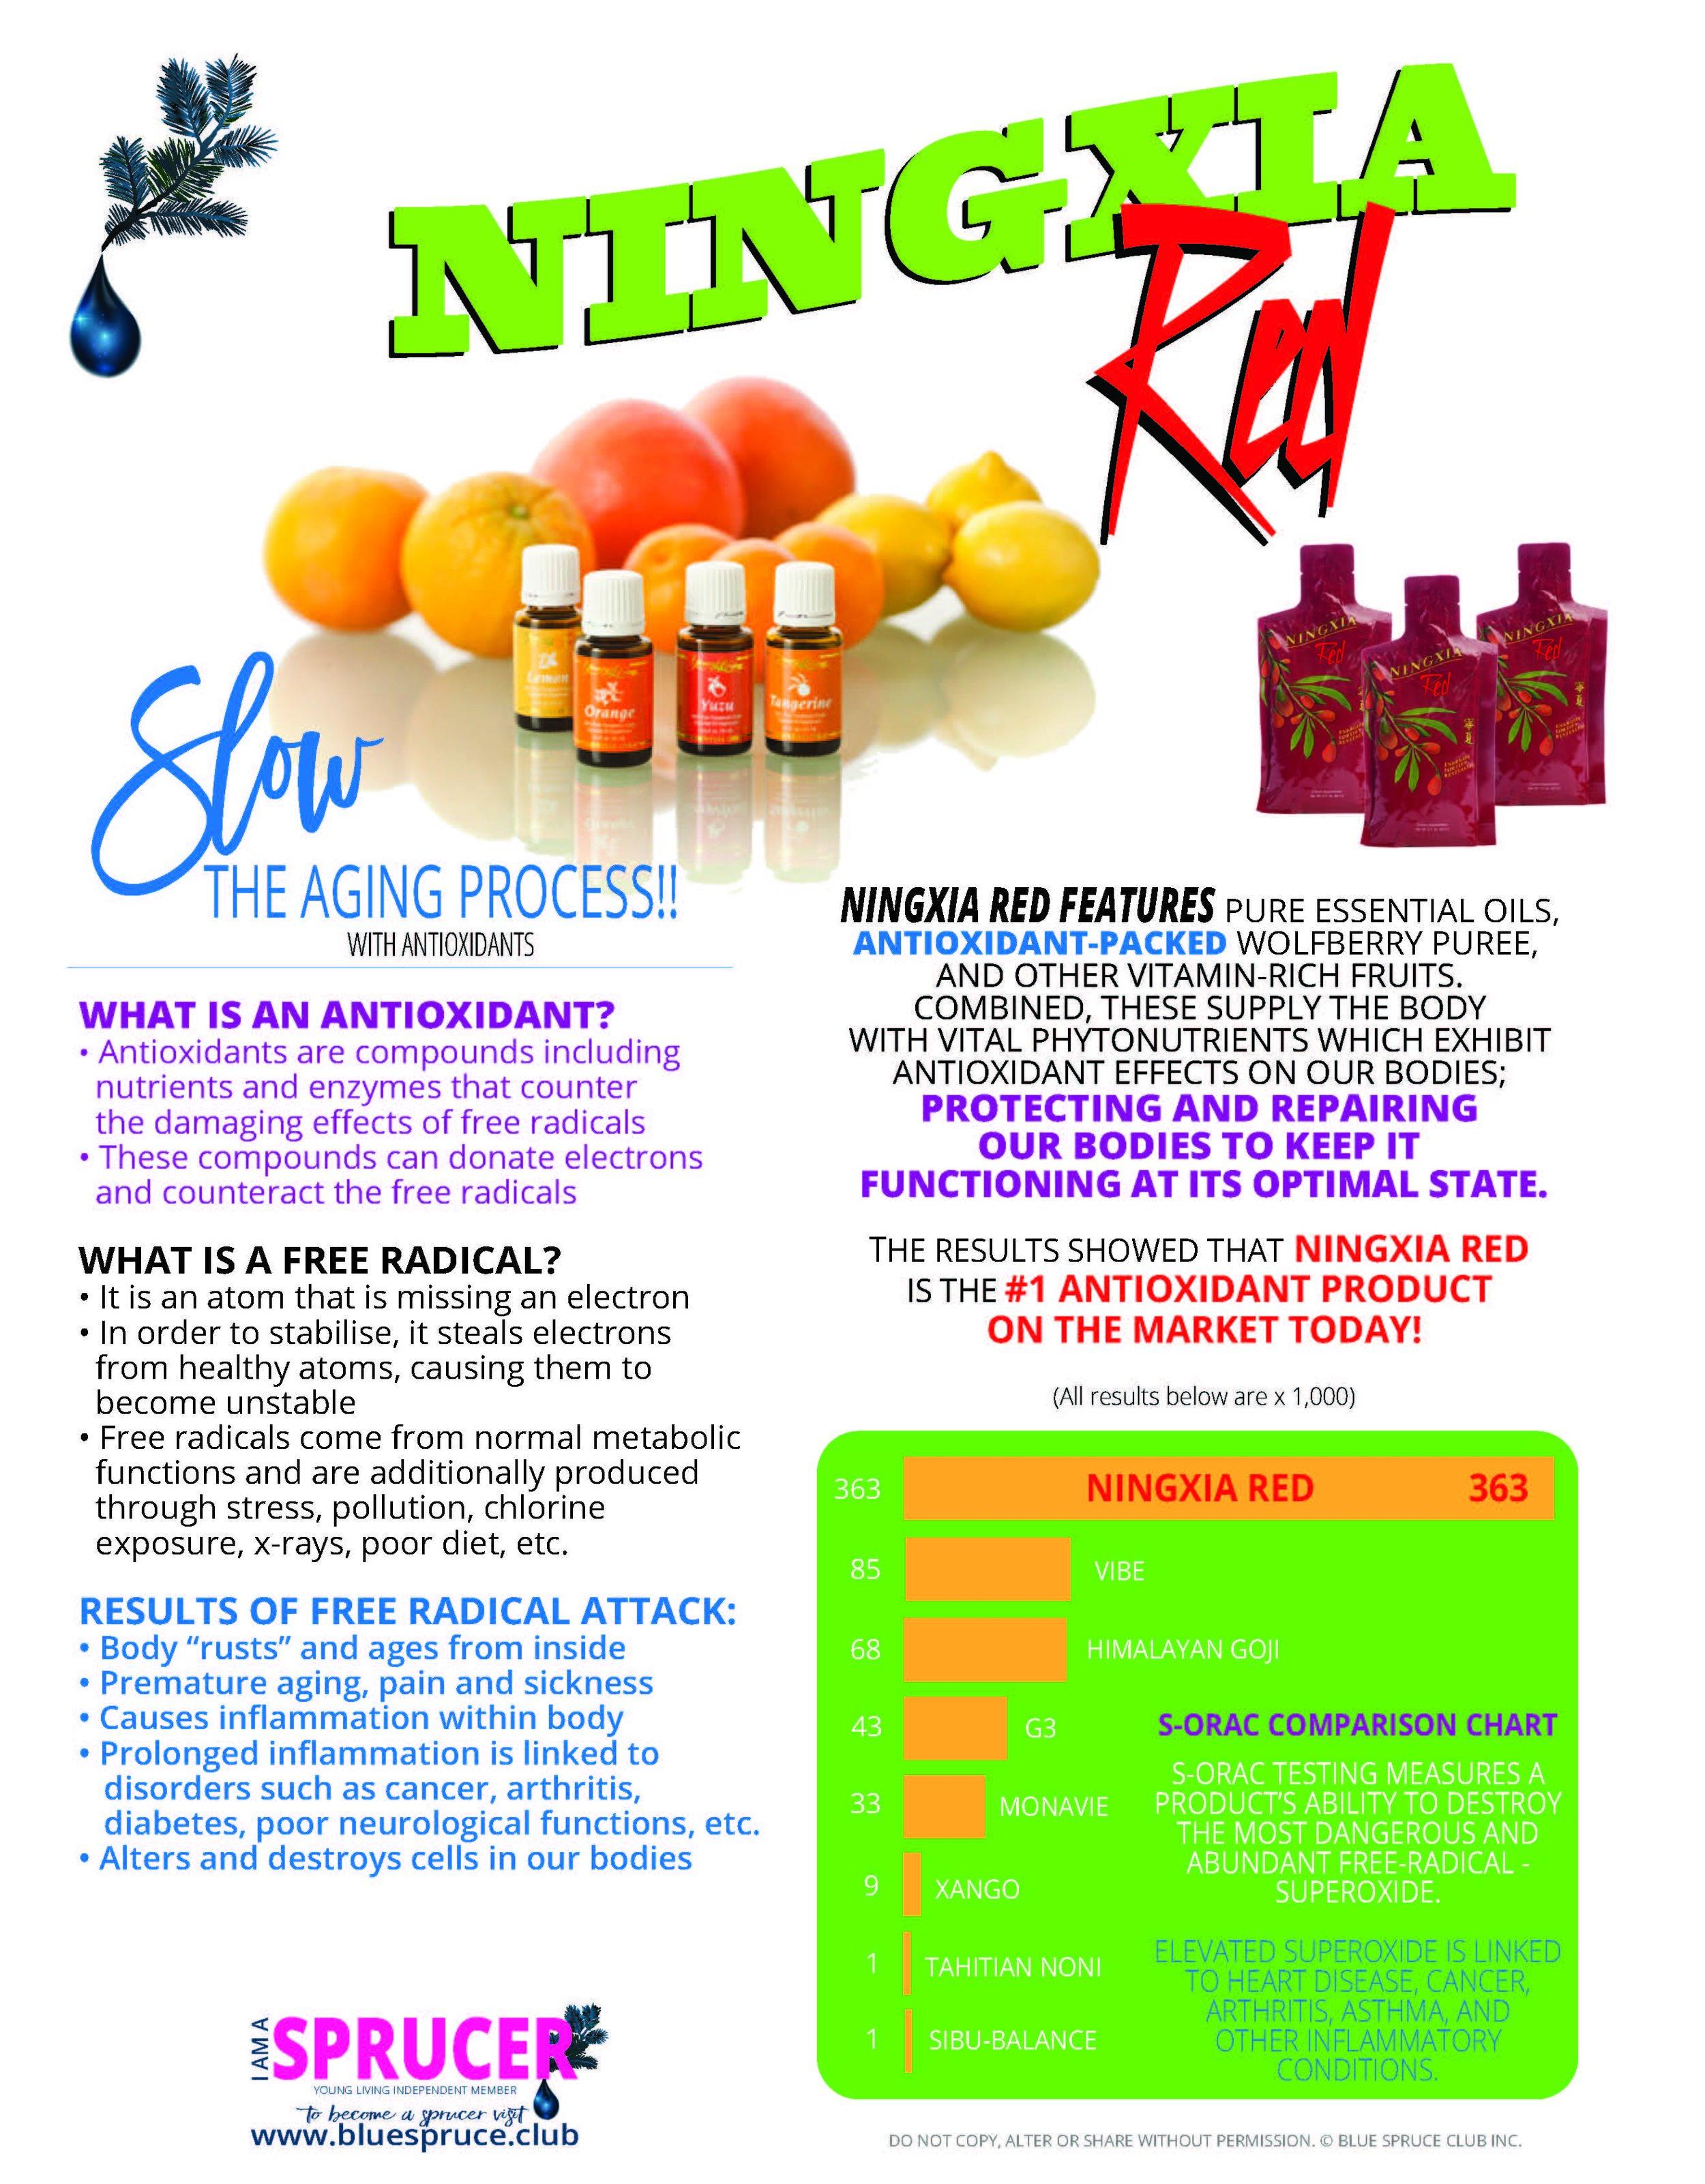 Ningxia Red Antioxidant Wolfberry Goji Drink